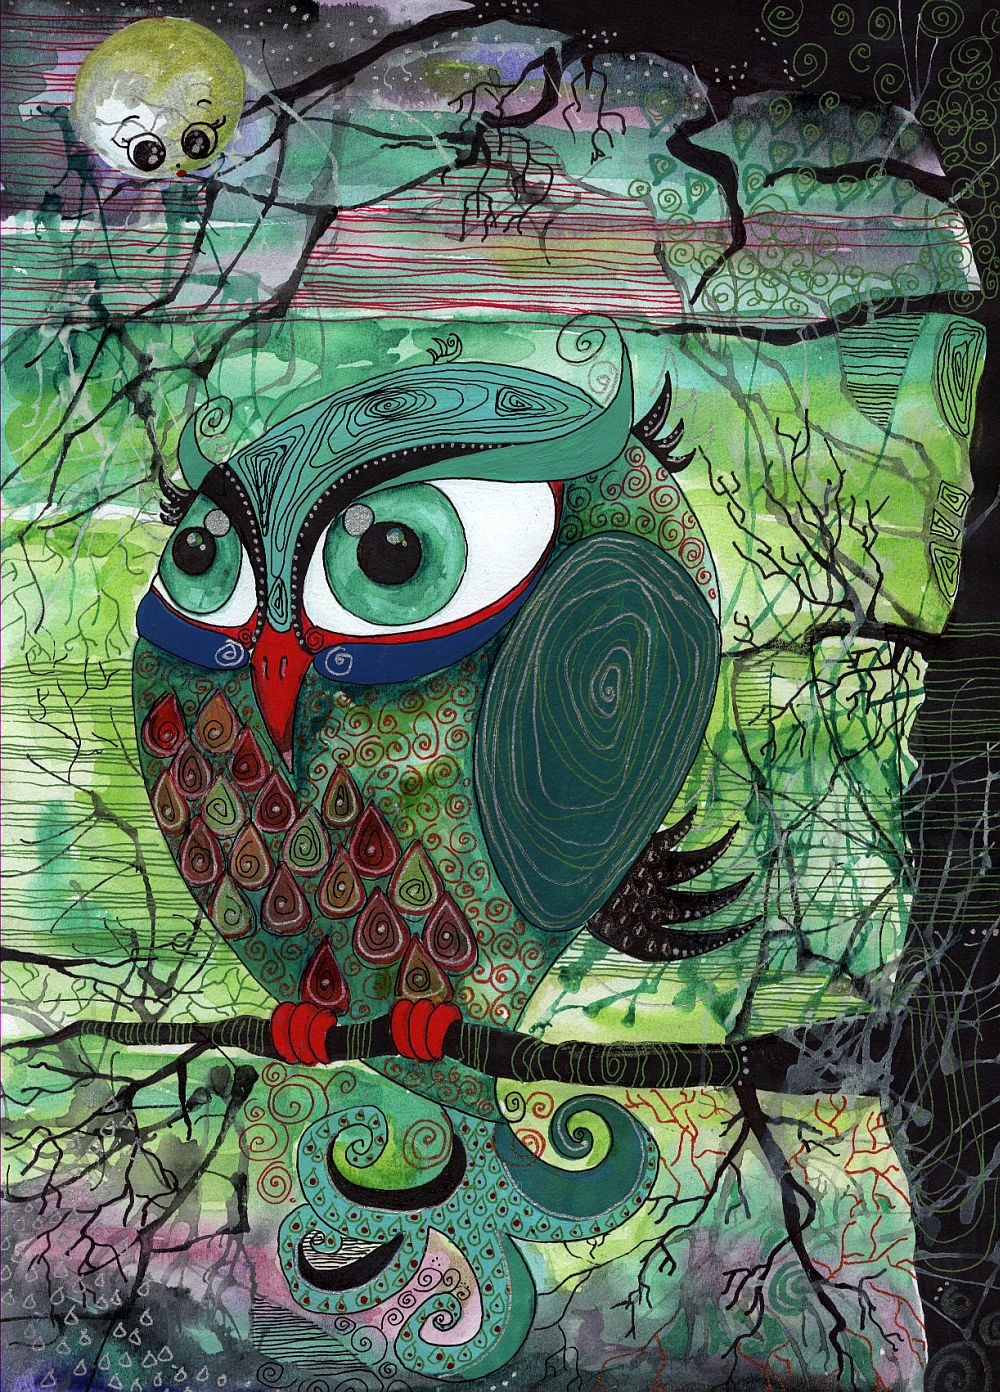 adelaparvu.com despre O povEstetica, expozitie la Pallets, artist Alina Borcea, lucrare Owl at dawn